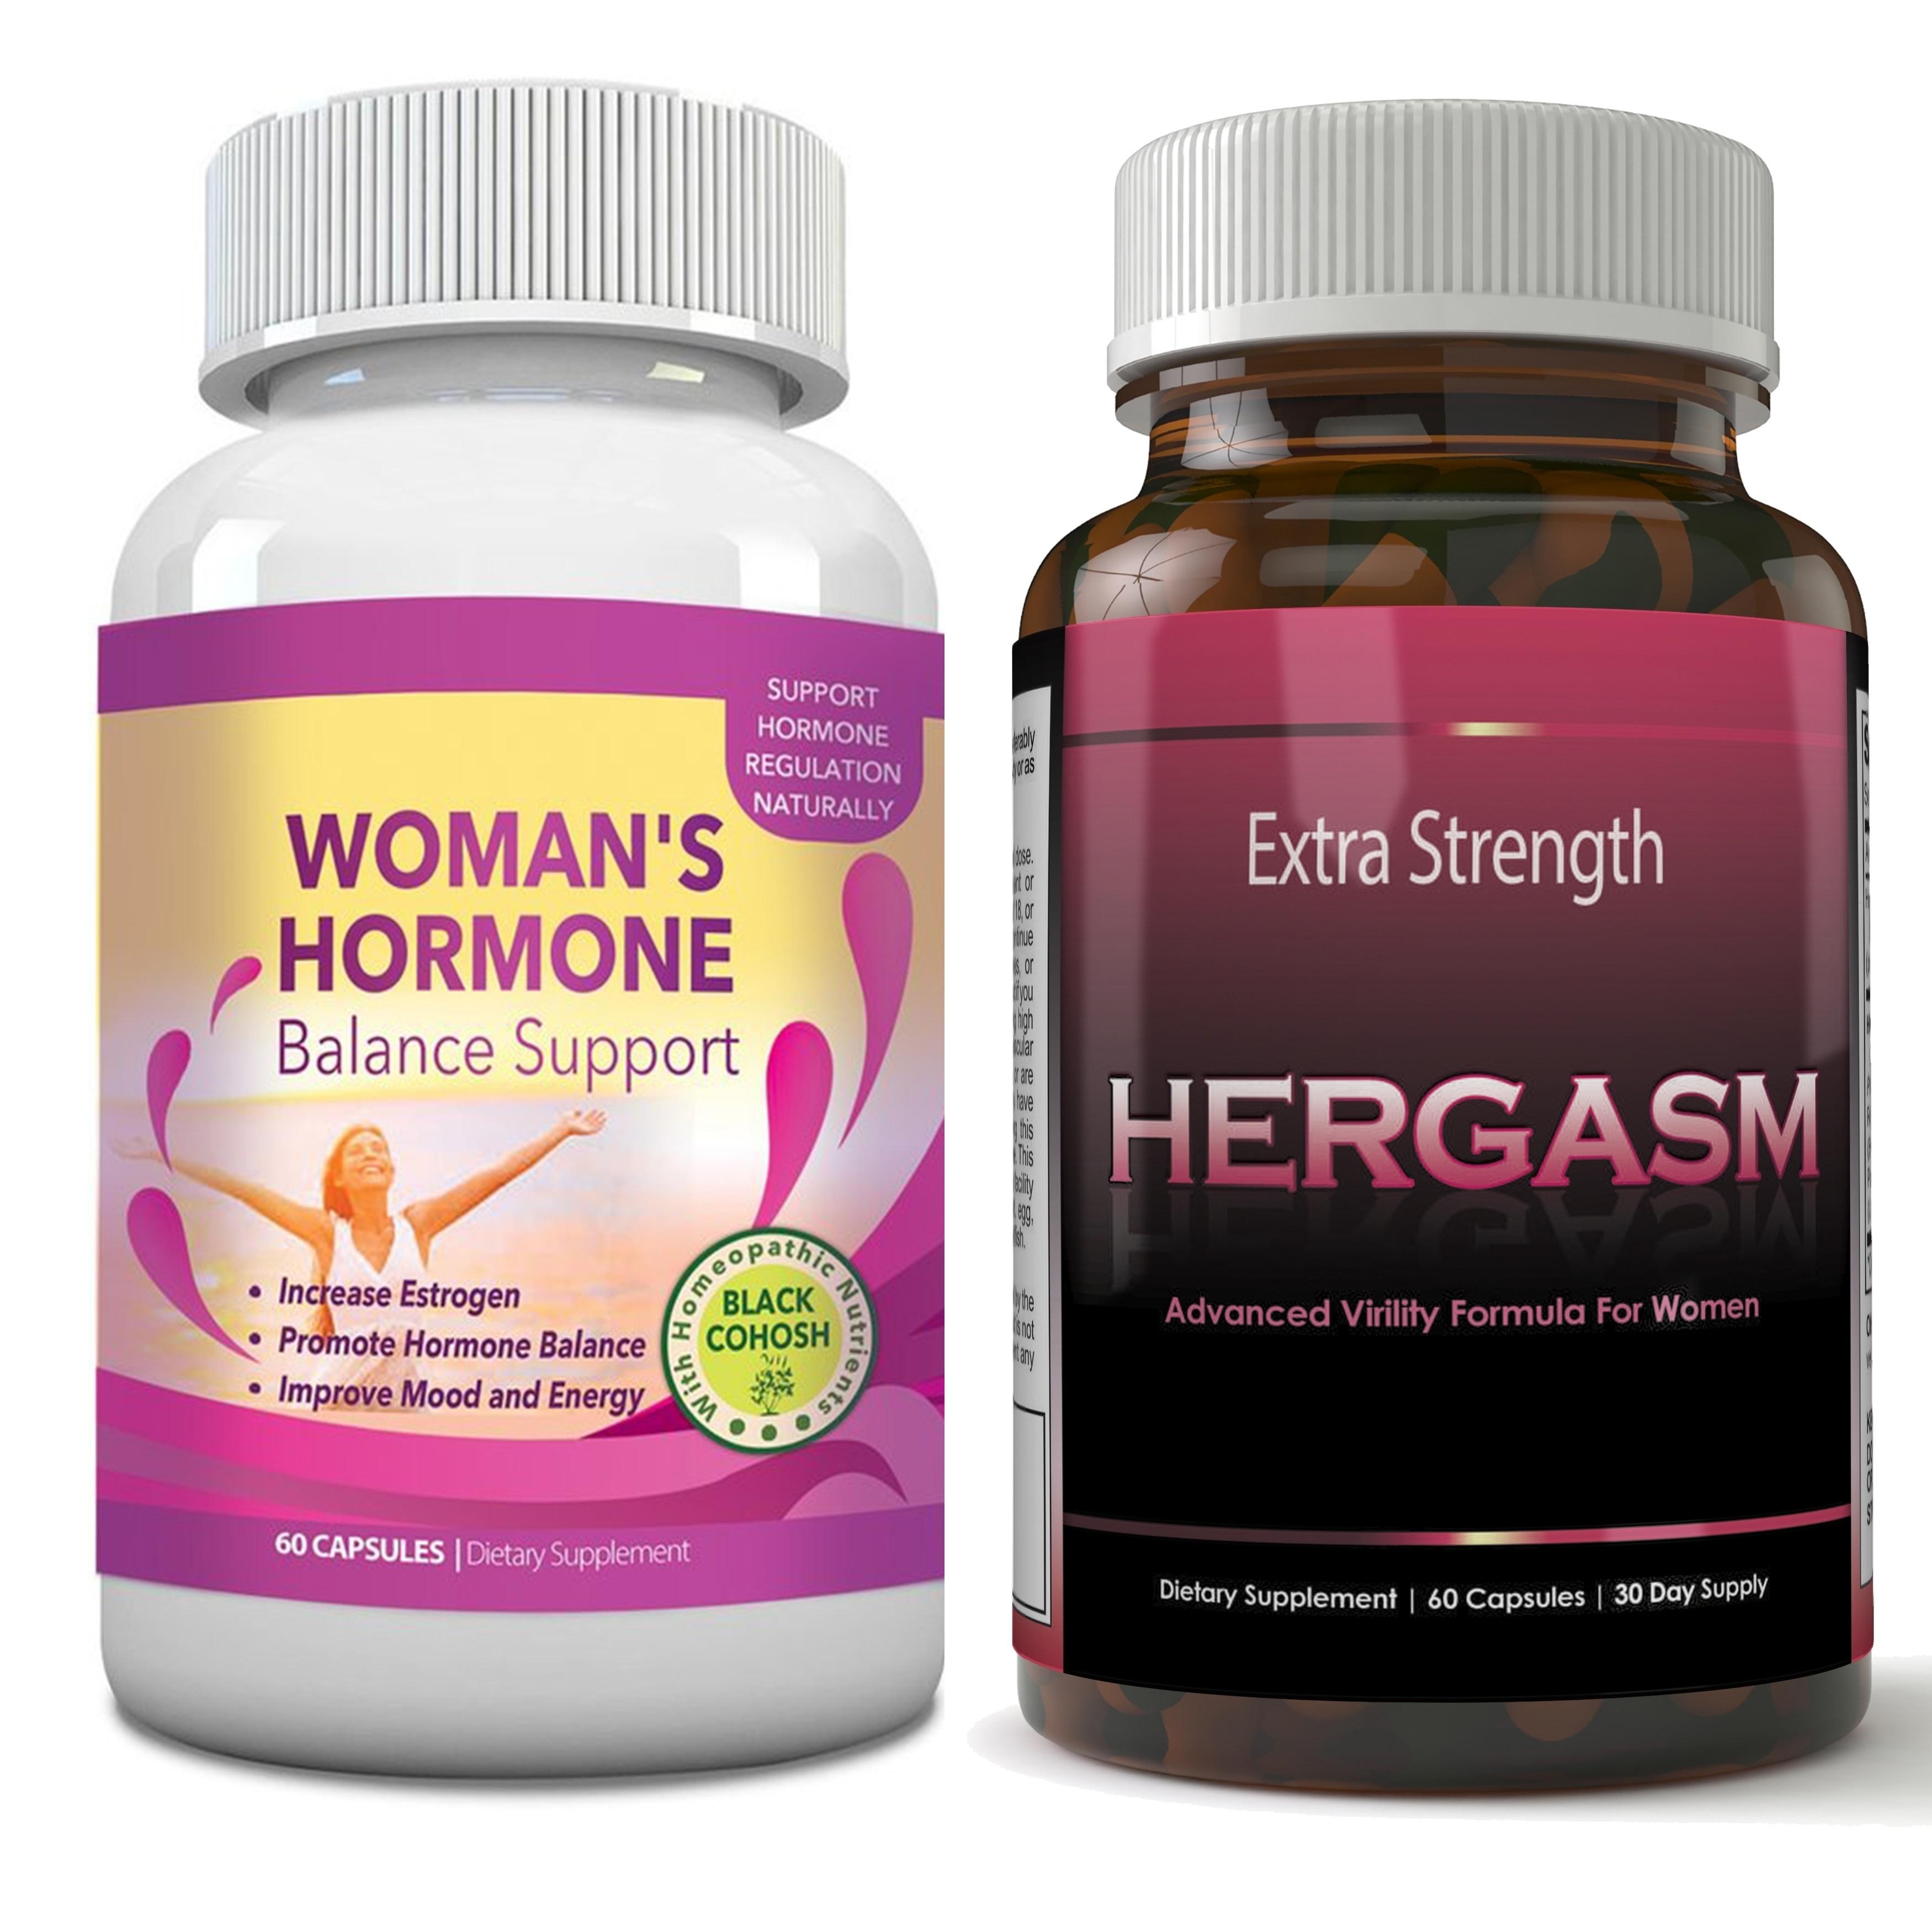 Shop Totally Products Hergasm Advanced Female Libido Virility